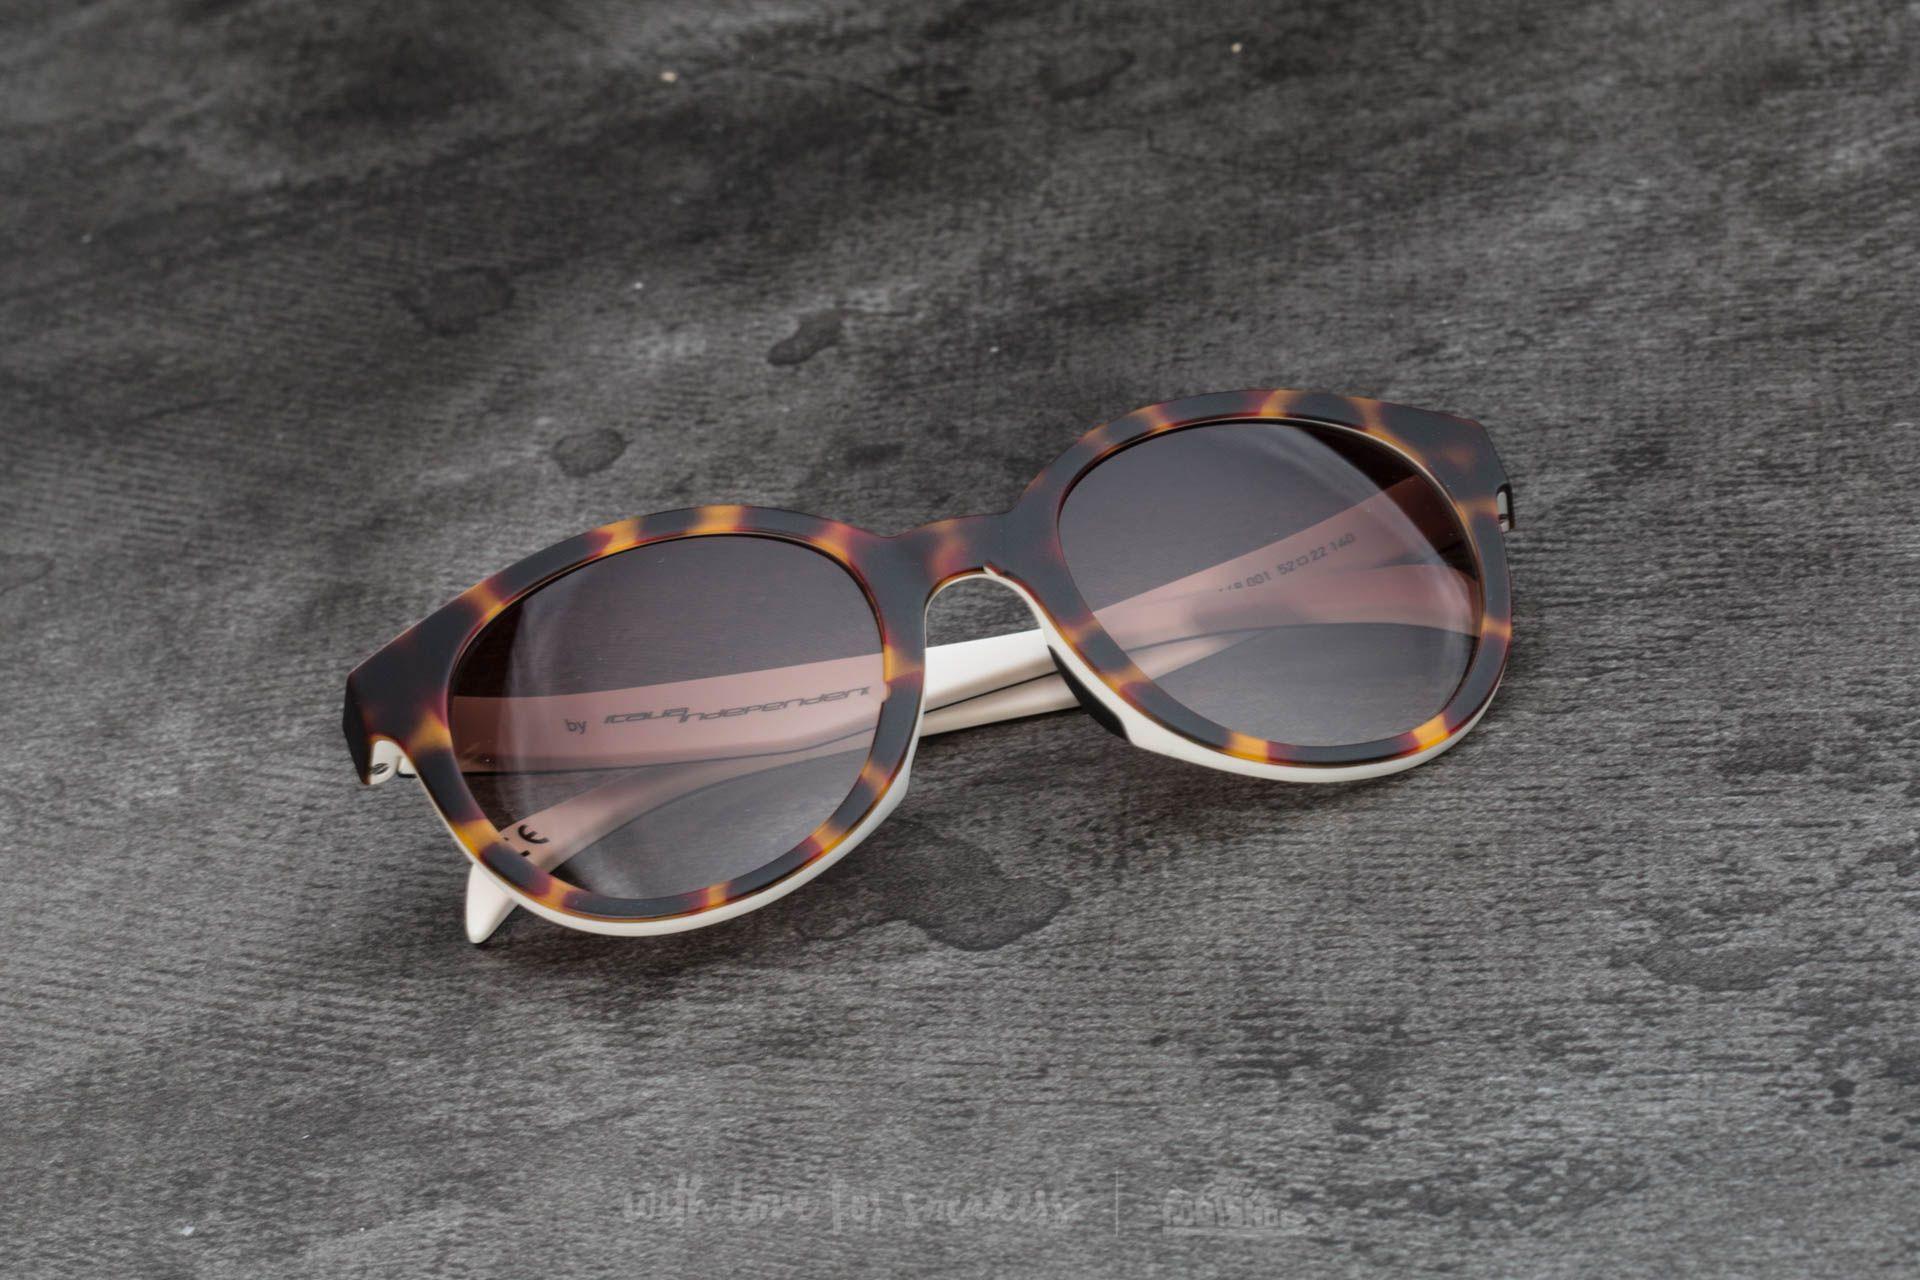 adidas x Italia Independent AOR002 Sunglasses Havana Brown/ White - 15094